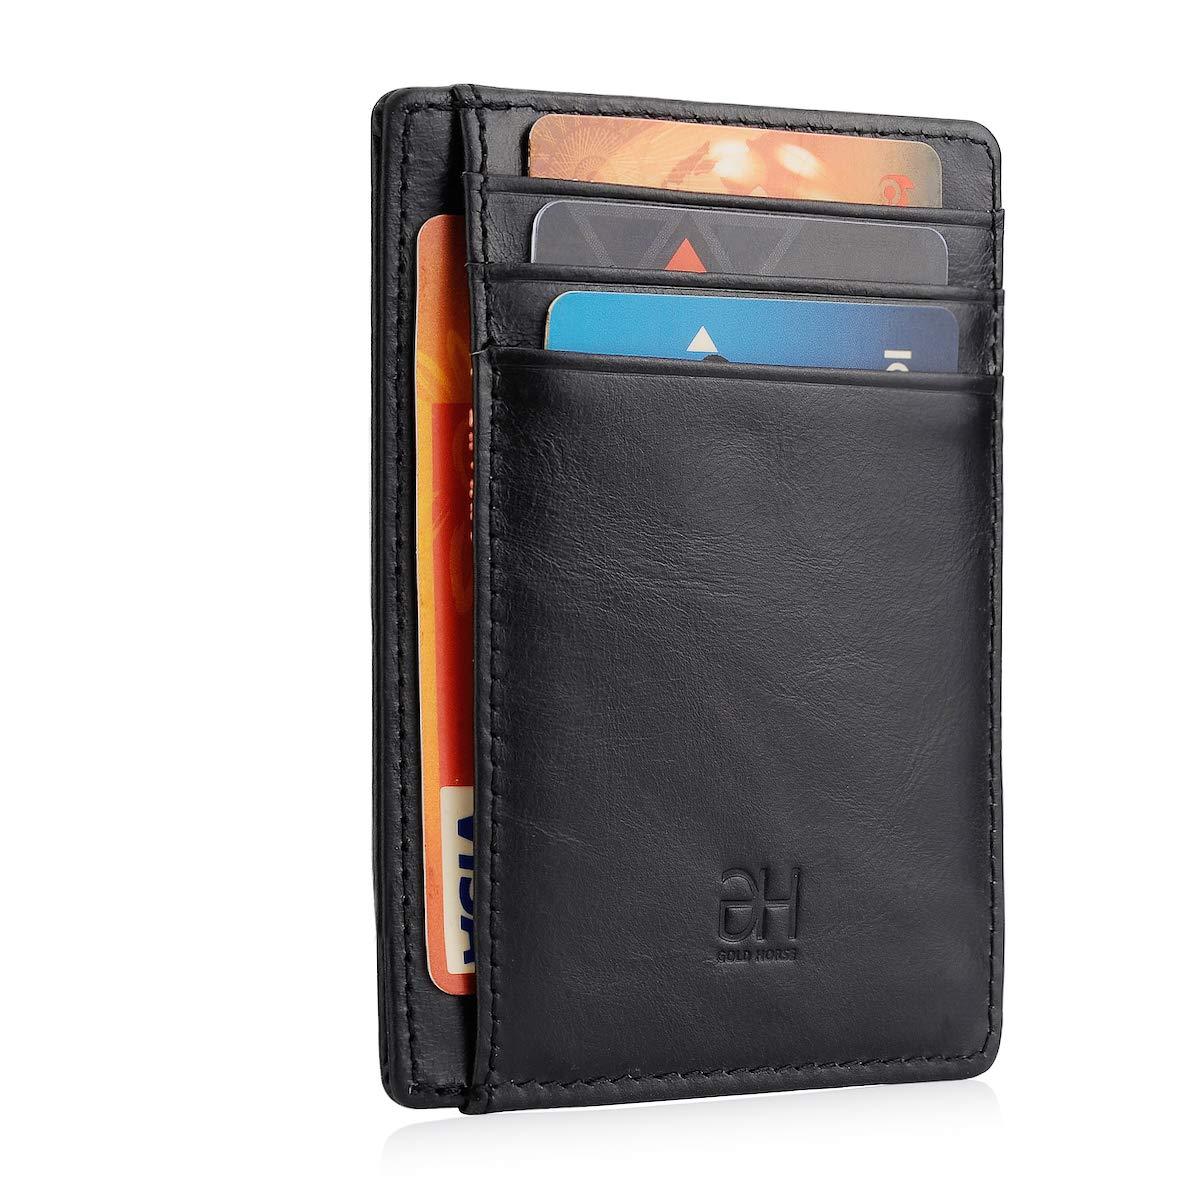 GH GOLD HORSE Slim RFID Blocking Card Holder Minimalist Leather Front Pocket Wallet for Women (Black)